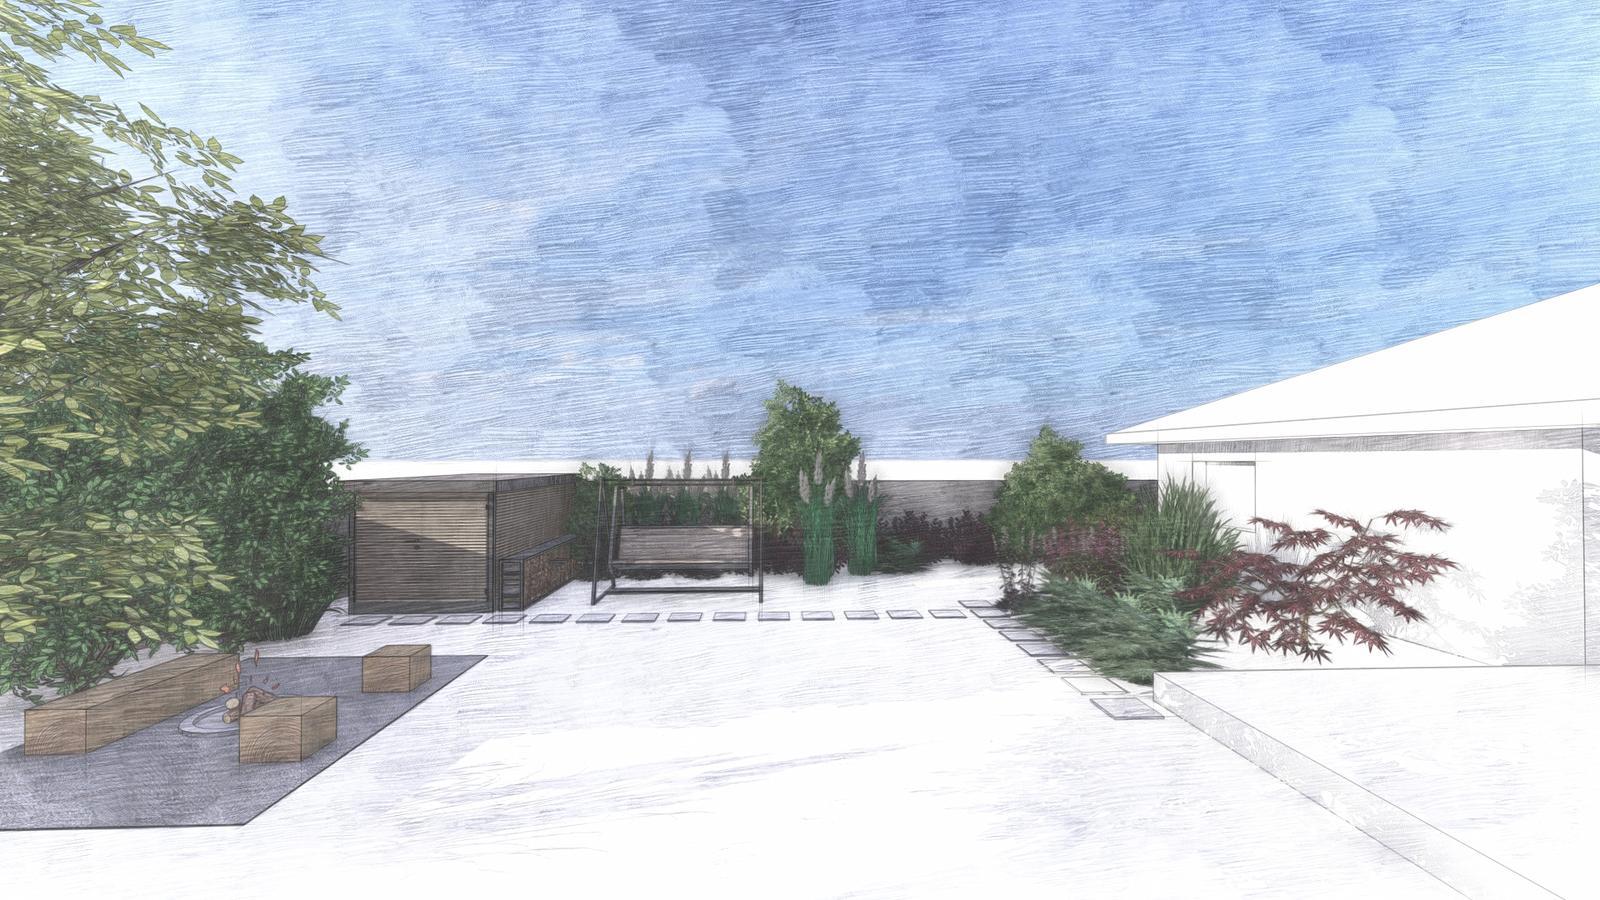 Návrh záhrady rodinného domu - Obrázok č. 20